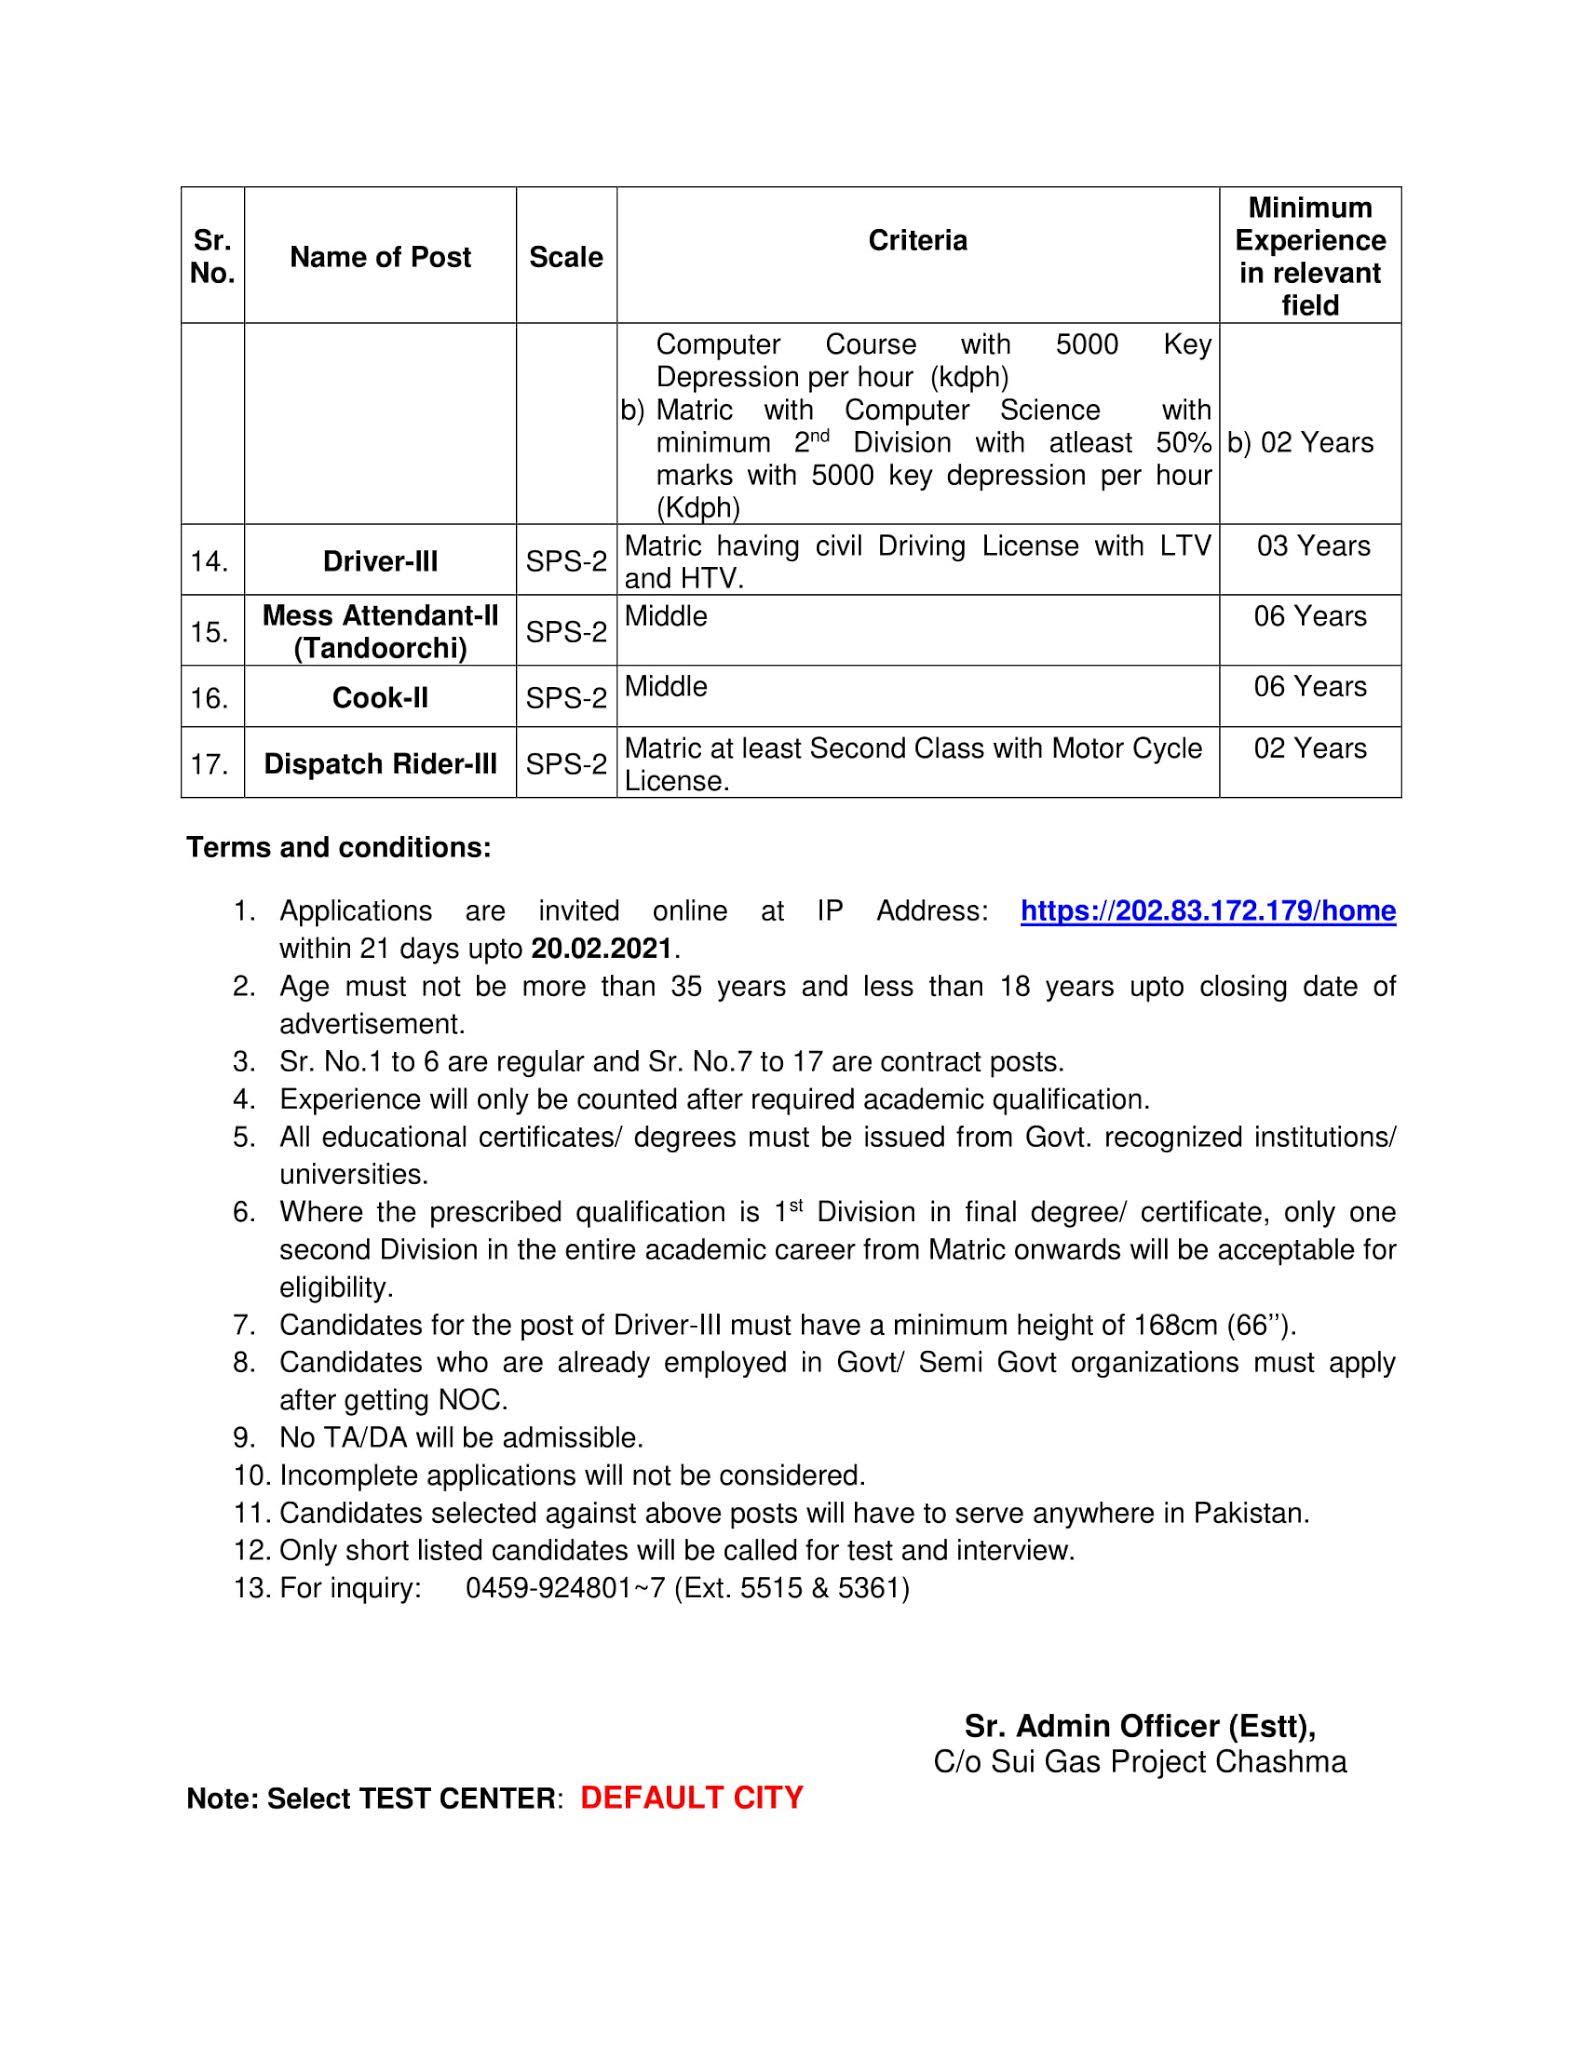 Sui Gas jobs 2021||Chashma Atomic Energy Jobs 2021